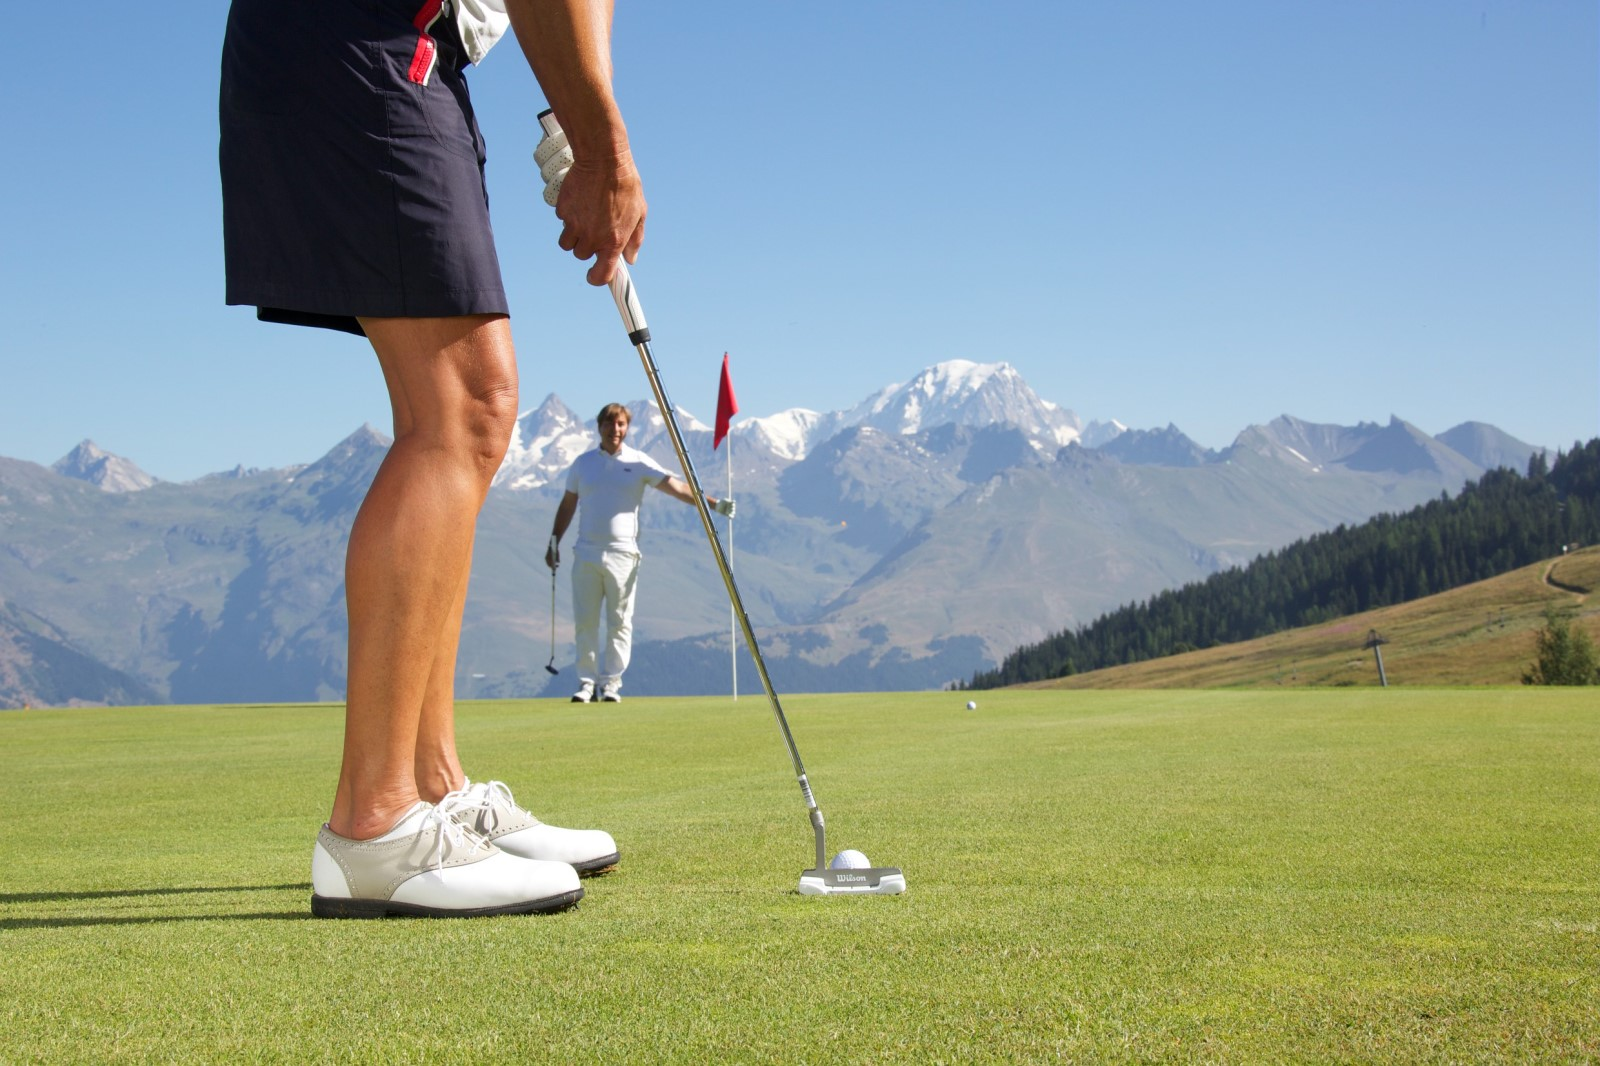 séjour golf aux arcs